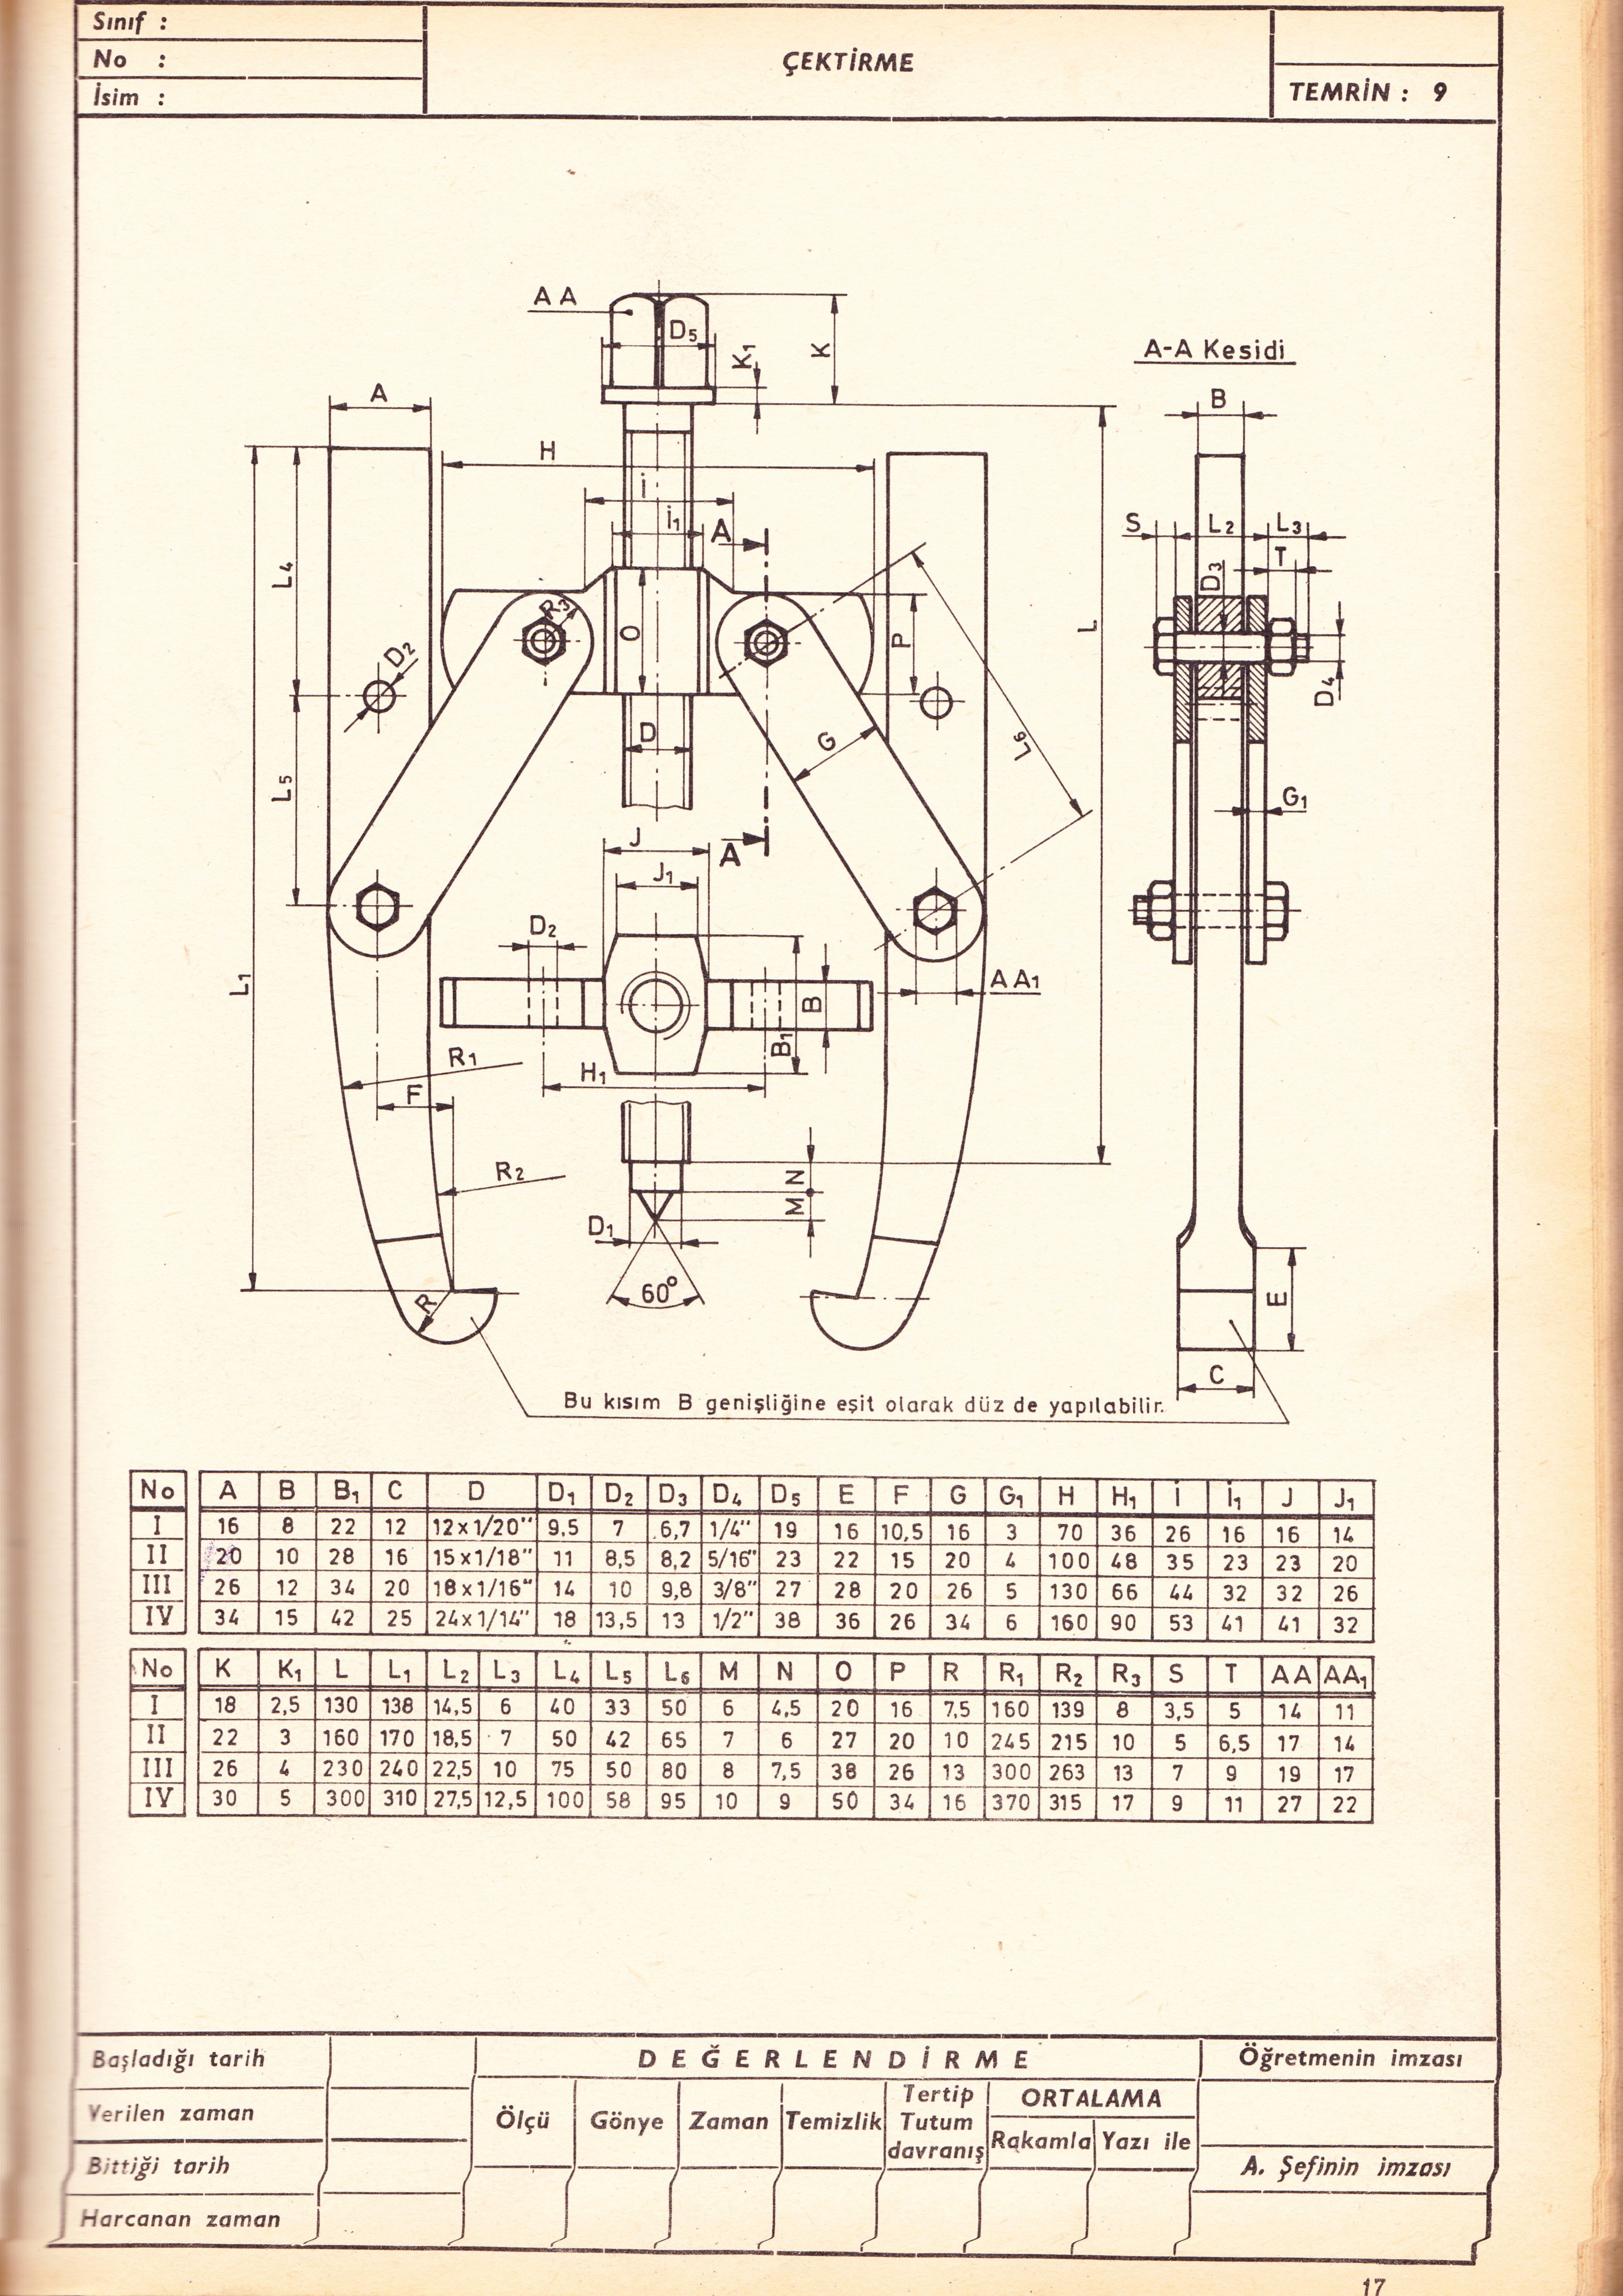 Prints Tools Tecnicas De Dibujo Fabricacion De Metales Dibujo Mecanico